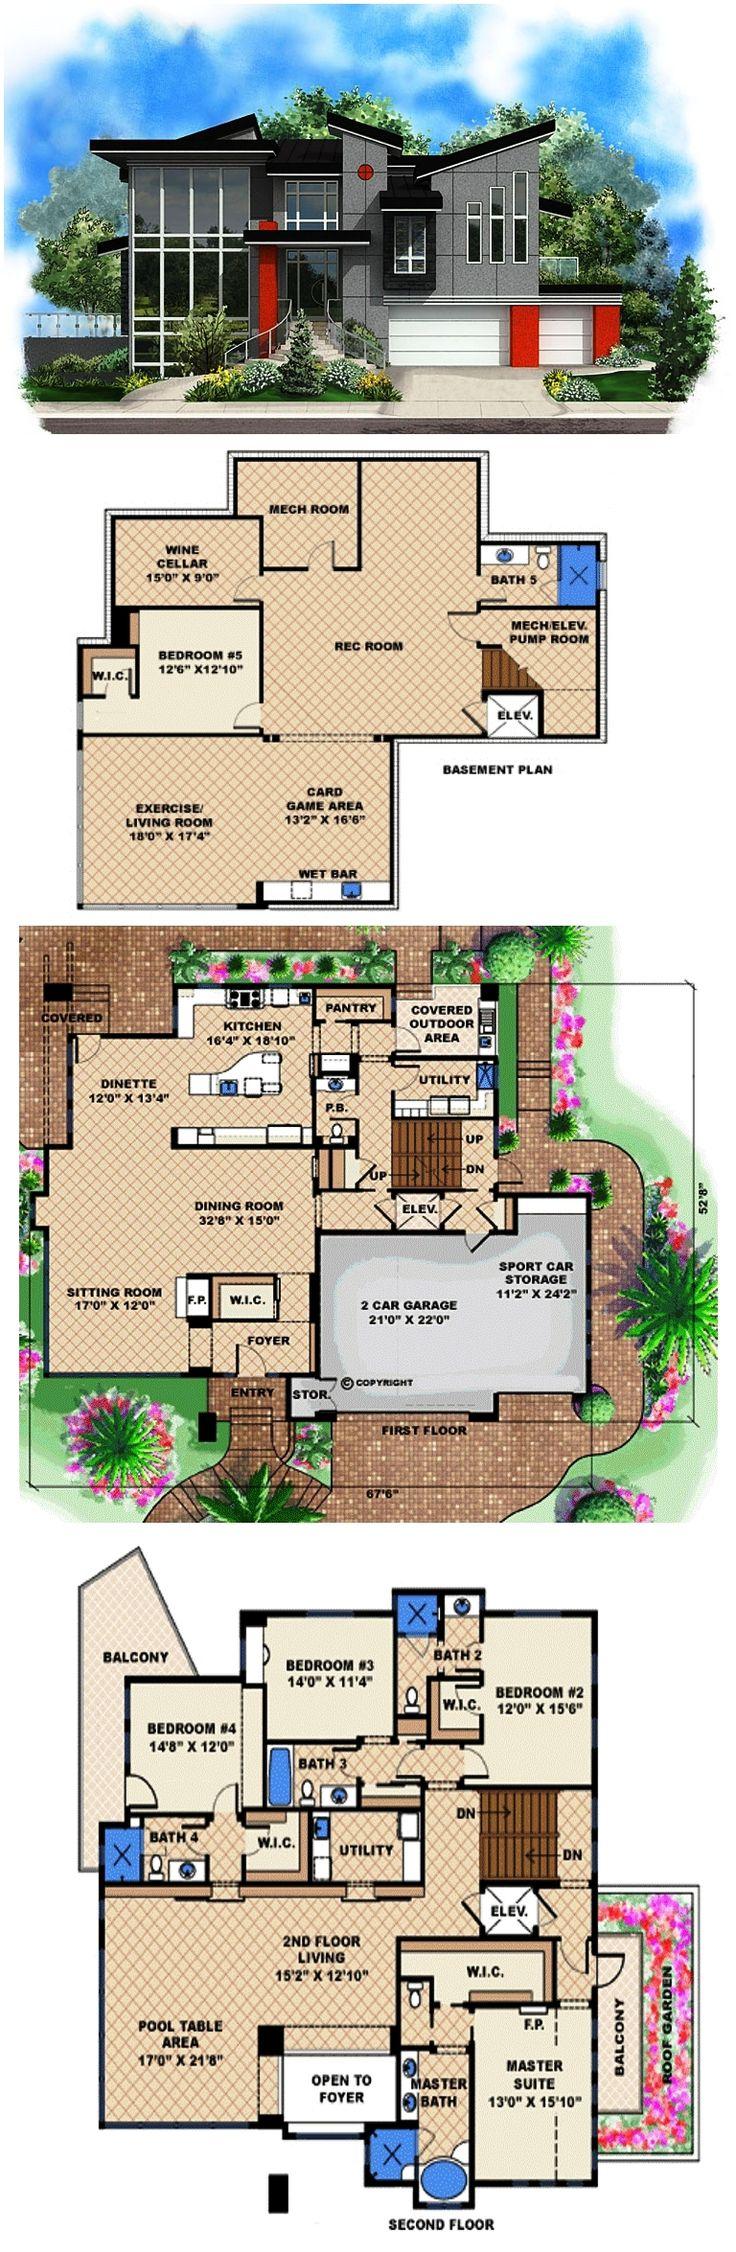 Modern Style House Plan 75953 3 Car Garage House Plans Modern Style House Plans New House Plans